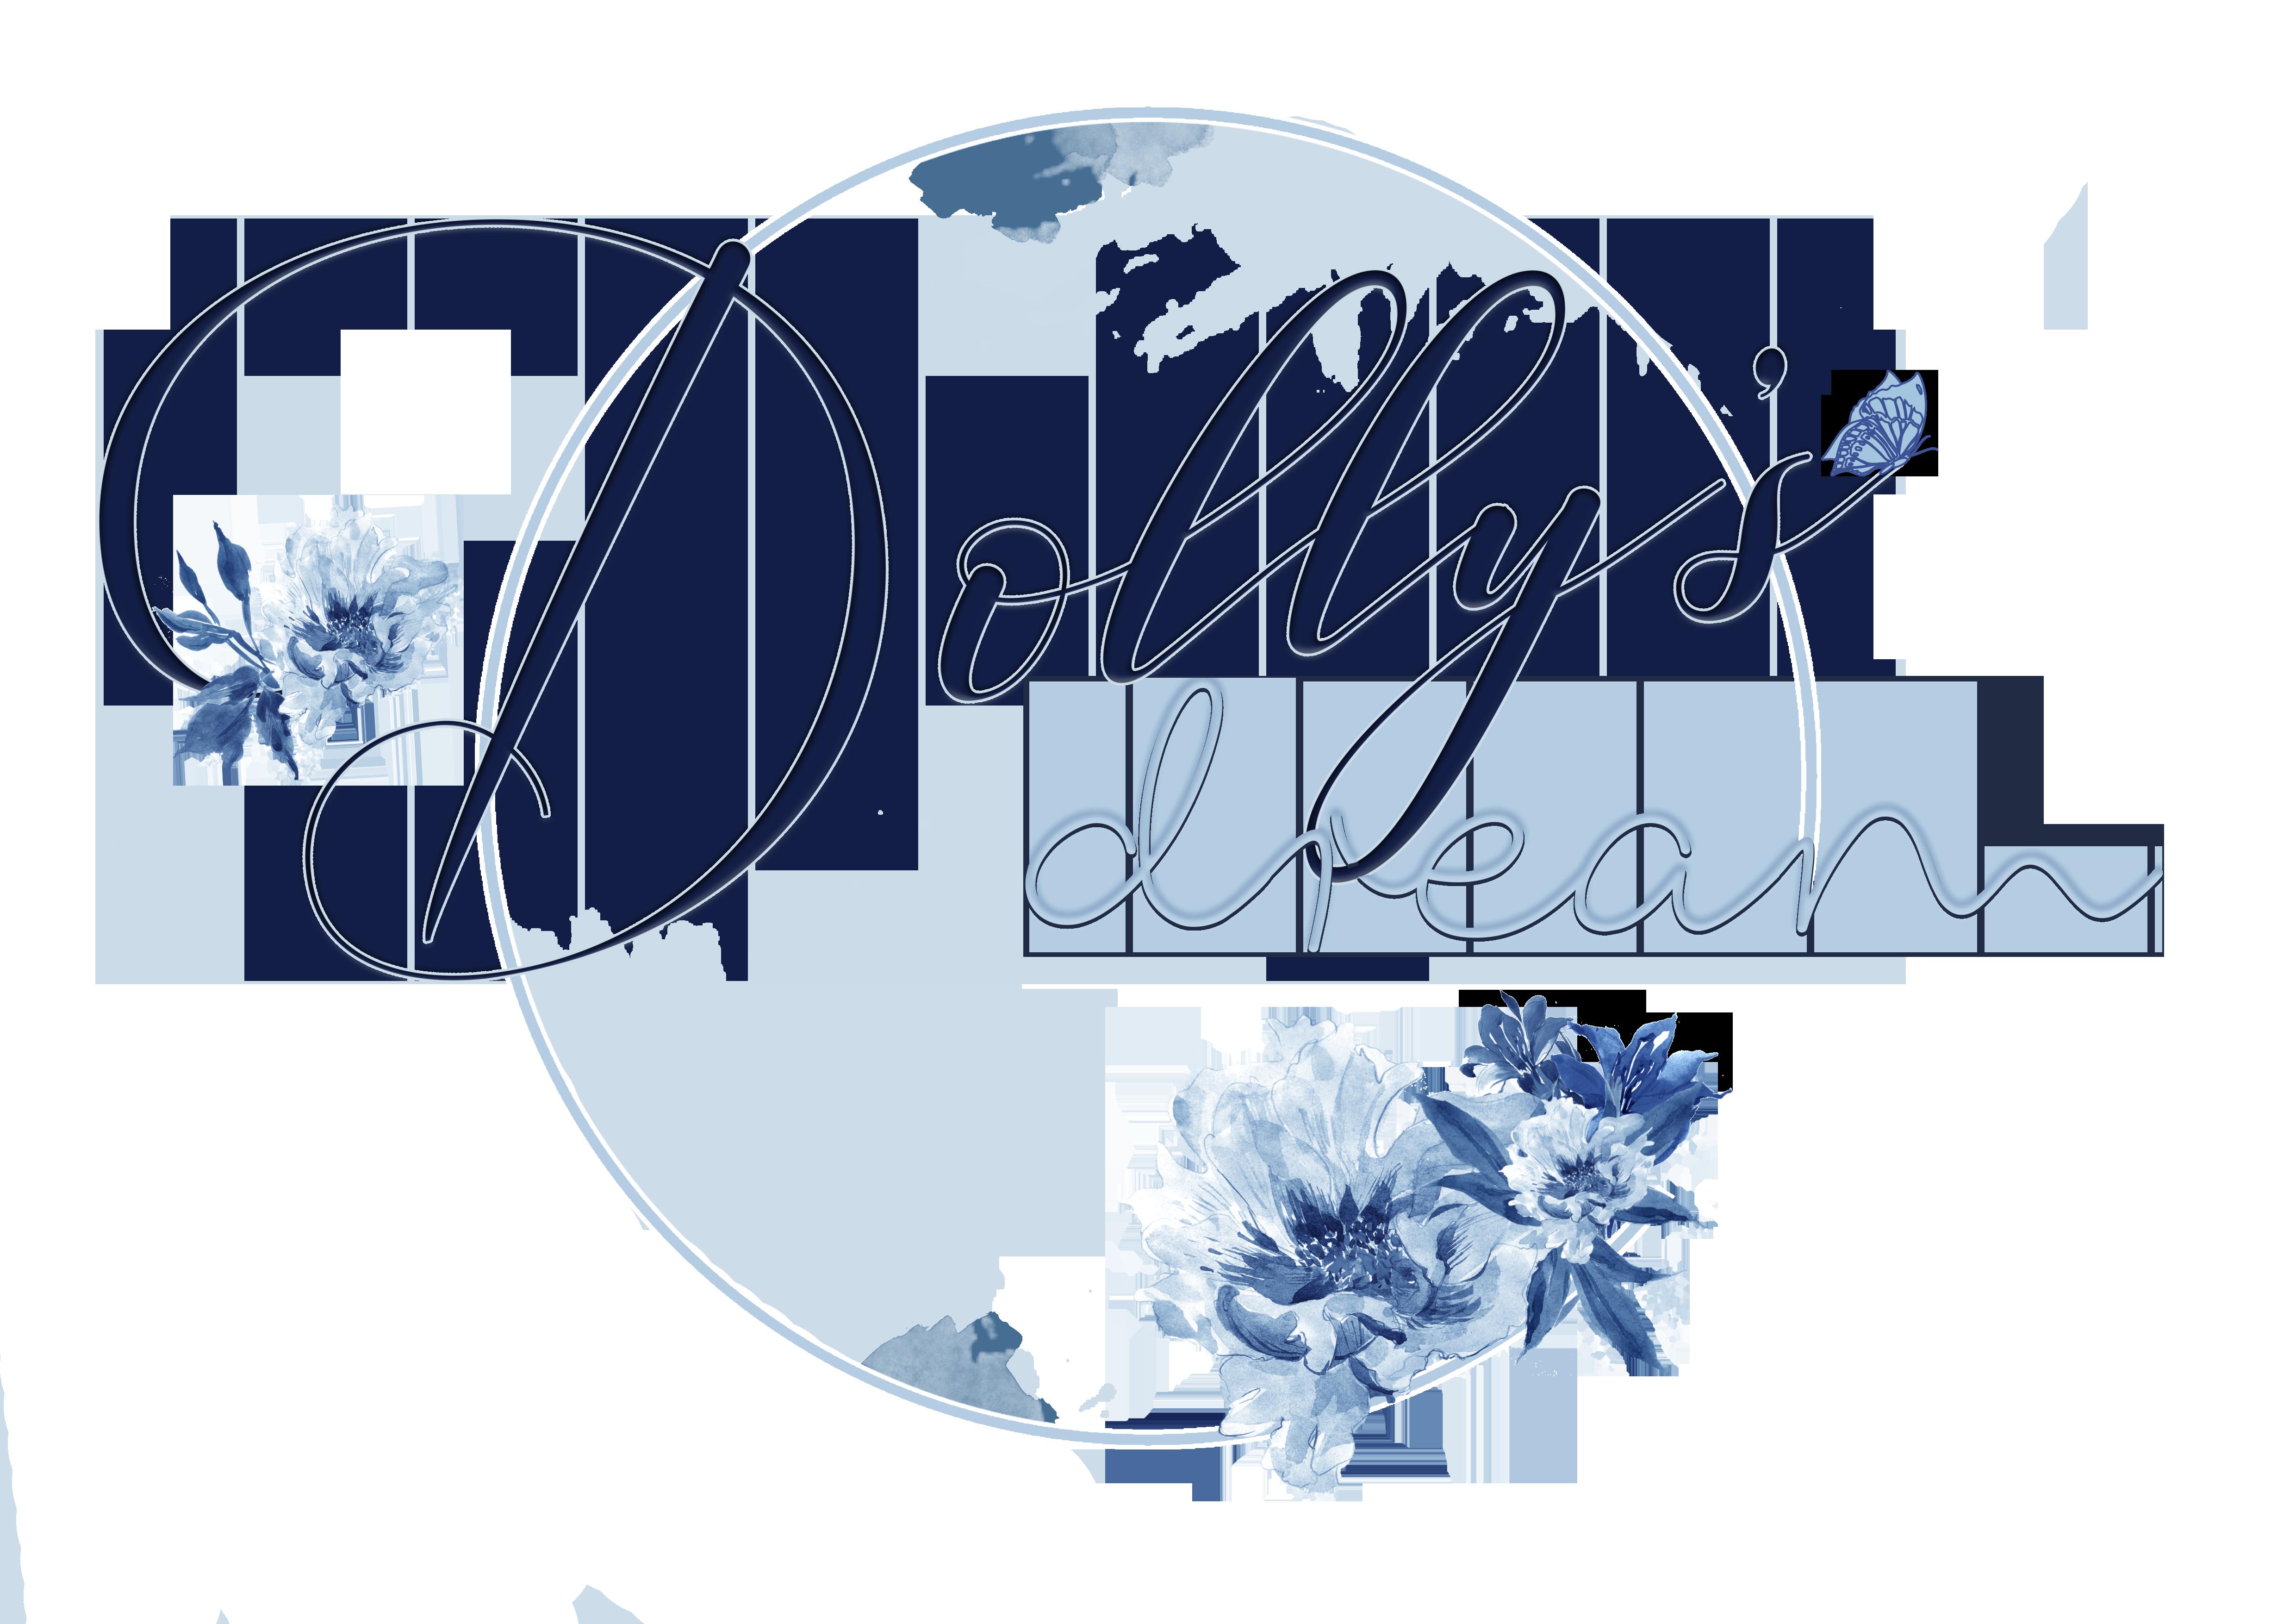 Dolly's Dream Final